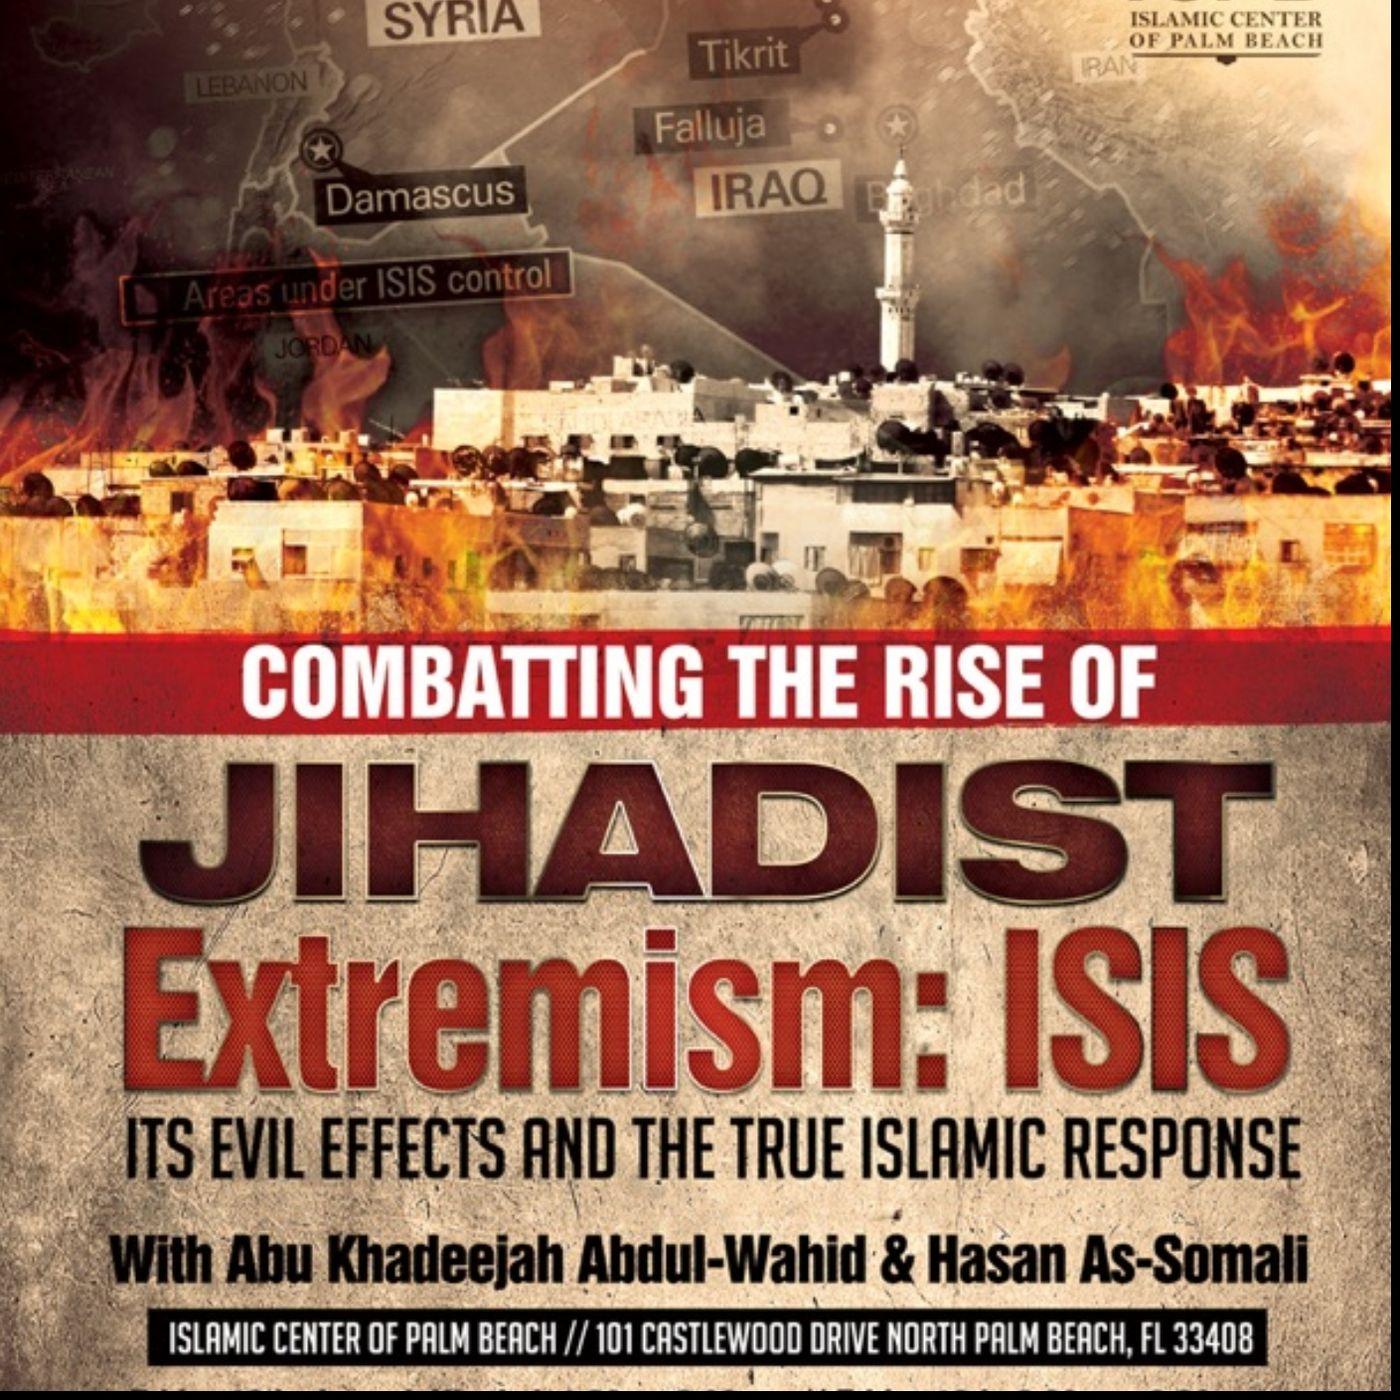 ICPB: Combatting Jihadist Extremism